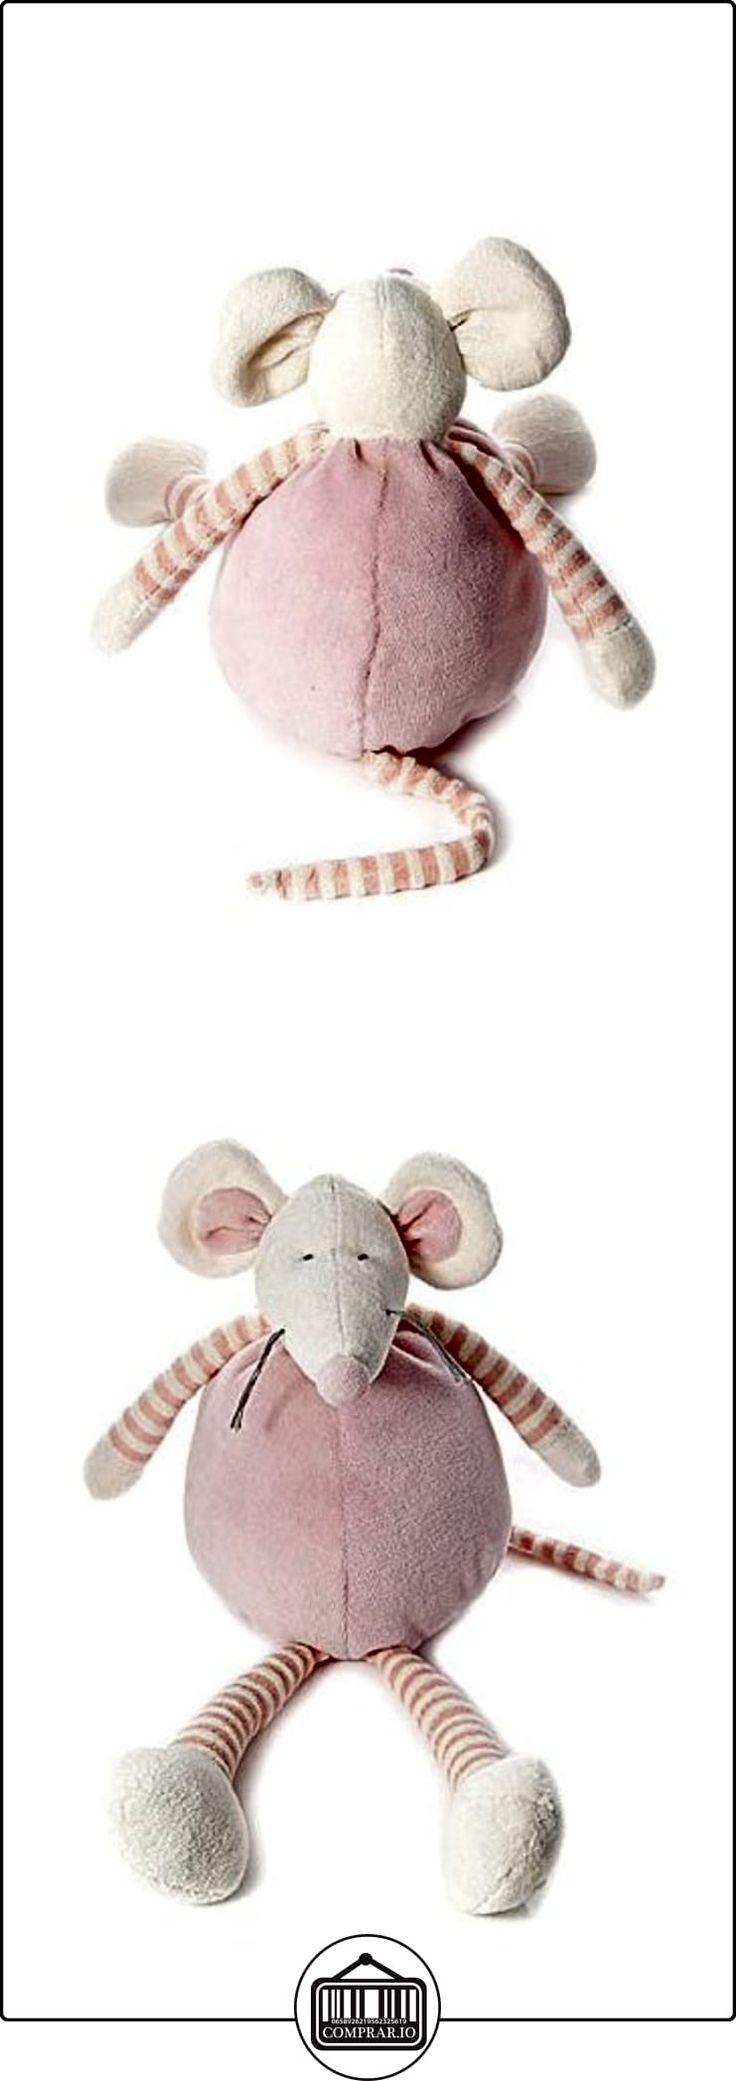 Ratita rosa de peluche de 34 cm para niñas recién nacidas  ✿ Regalos para recién nacidos - Bebes ✿ ▬► Ver oferta: http://comprar.io/goto/B00D91SXSI